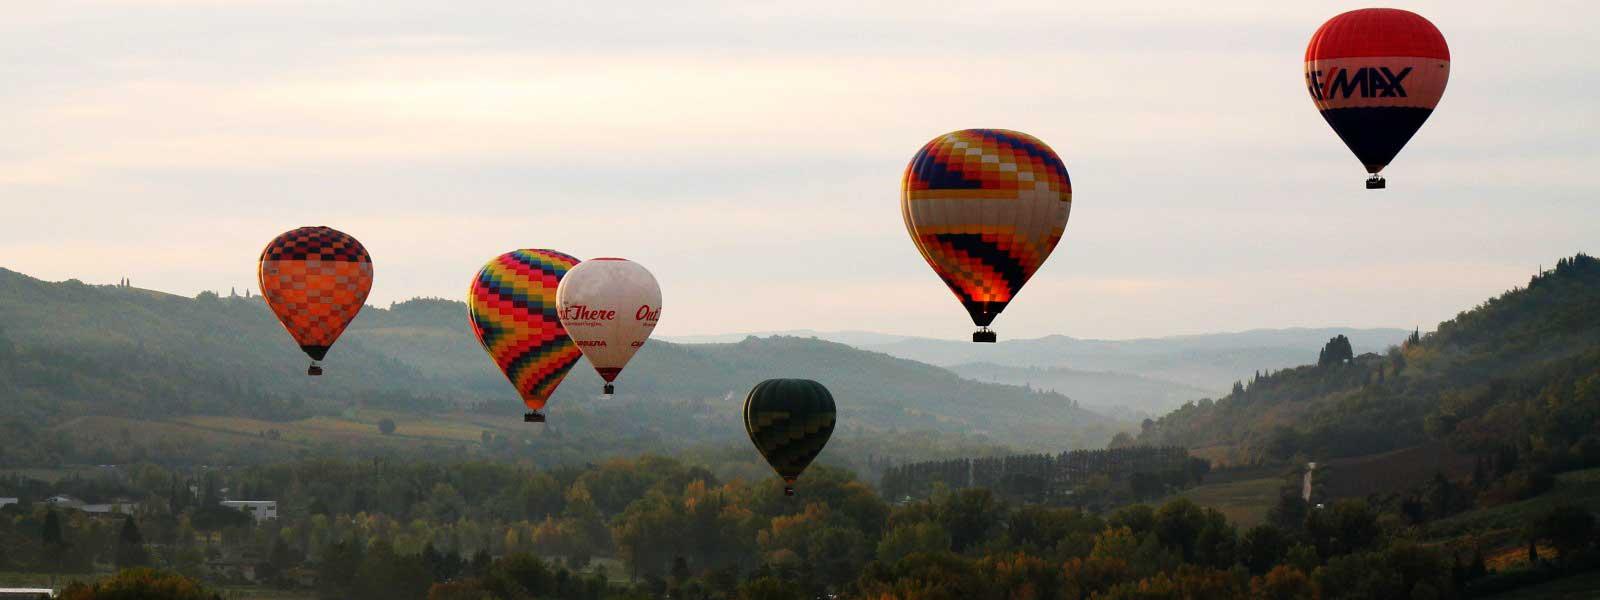 balloon-fleet-in-flight-chianti-tuscany-italy-florence